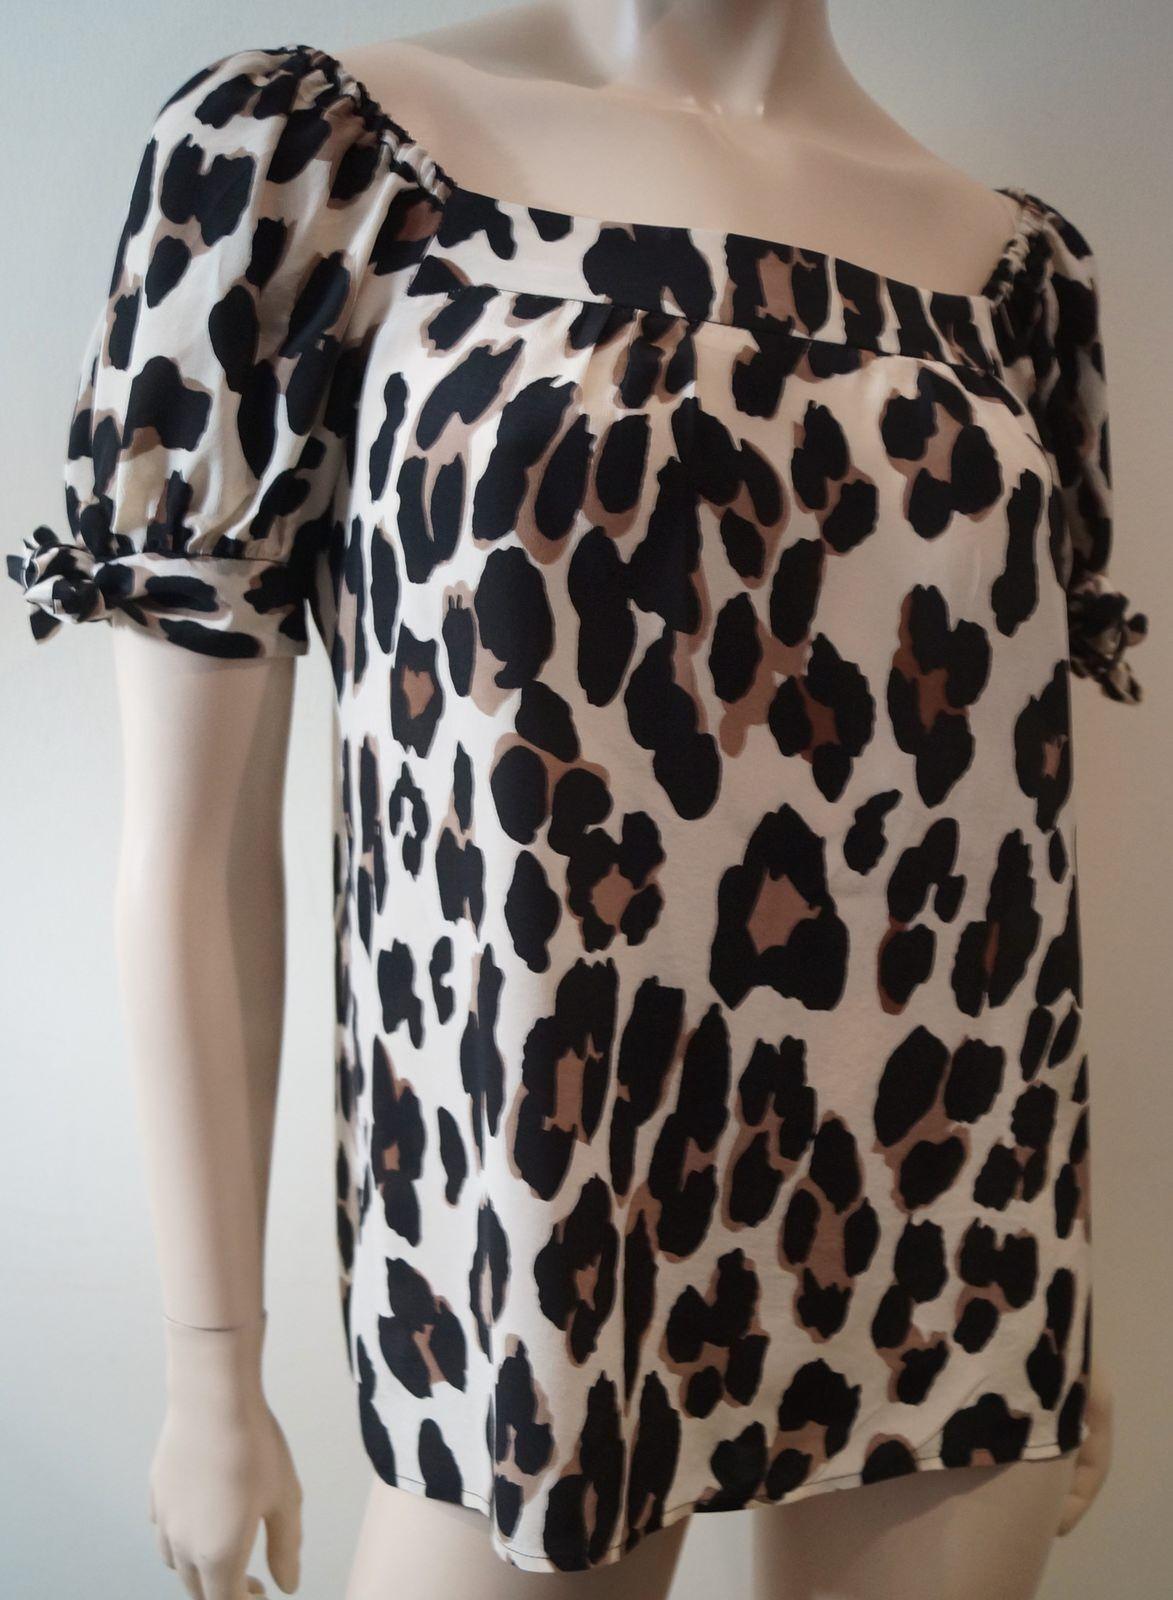 NANETTE LEPORE damen Cream braun & schwarz Leopard Print Short Sleeve Top US4 UK8